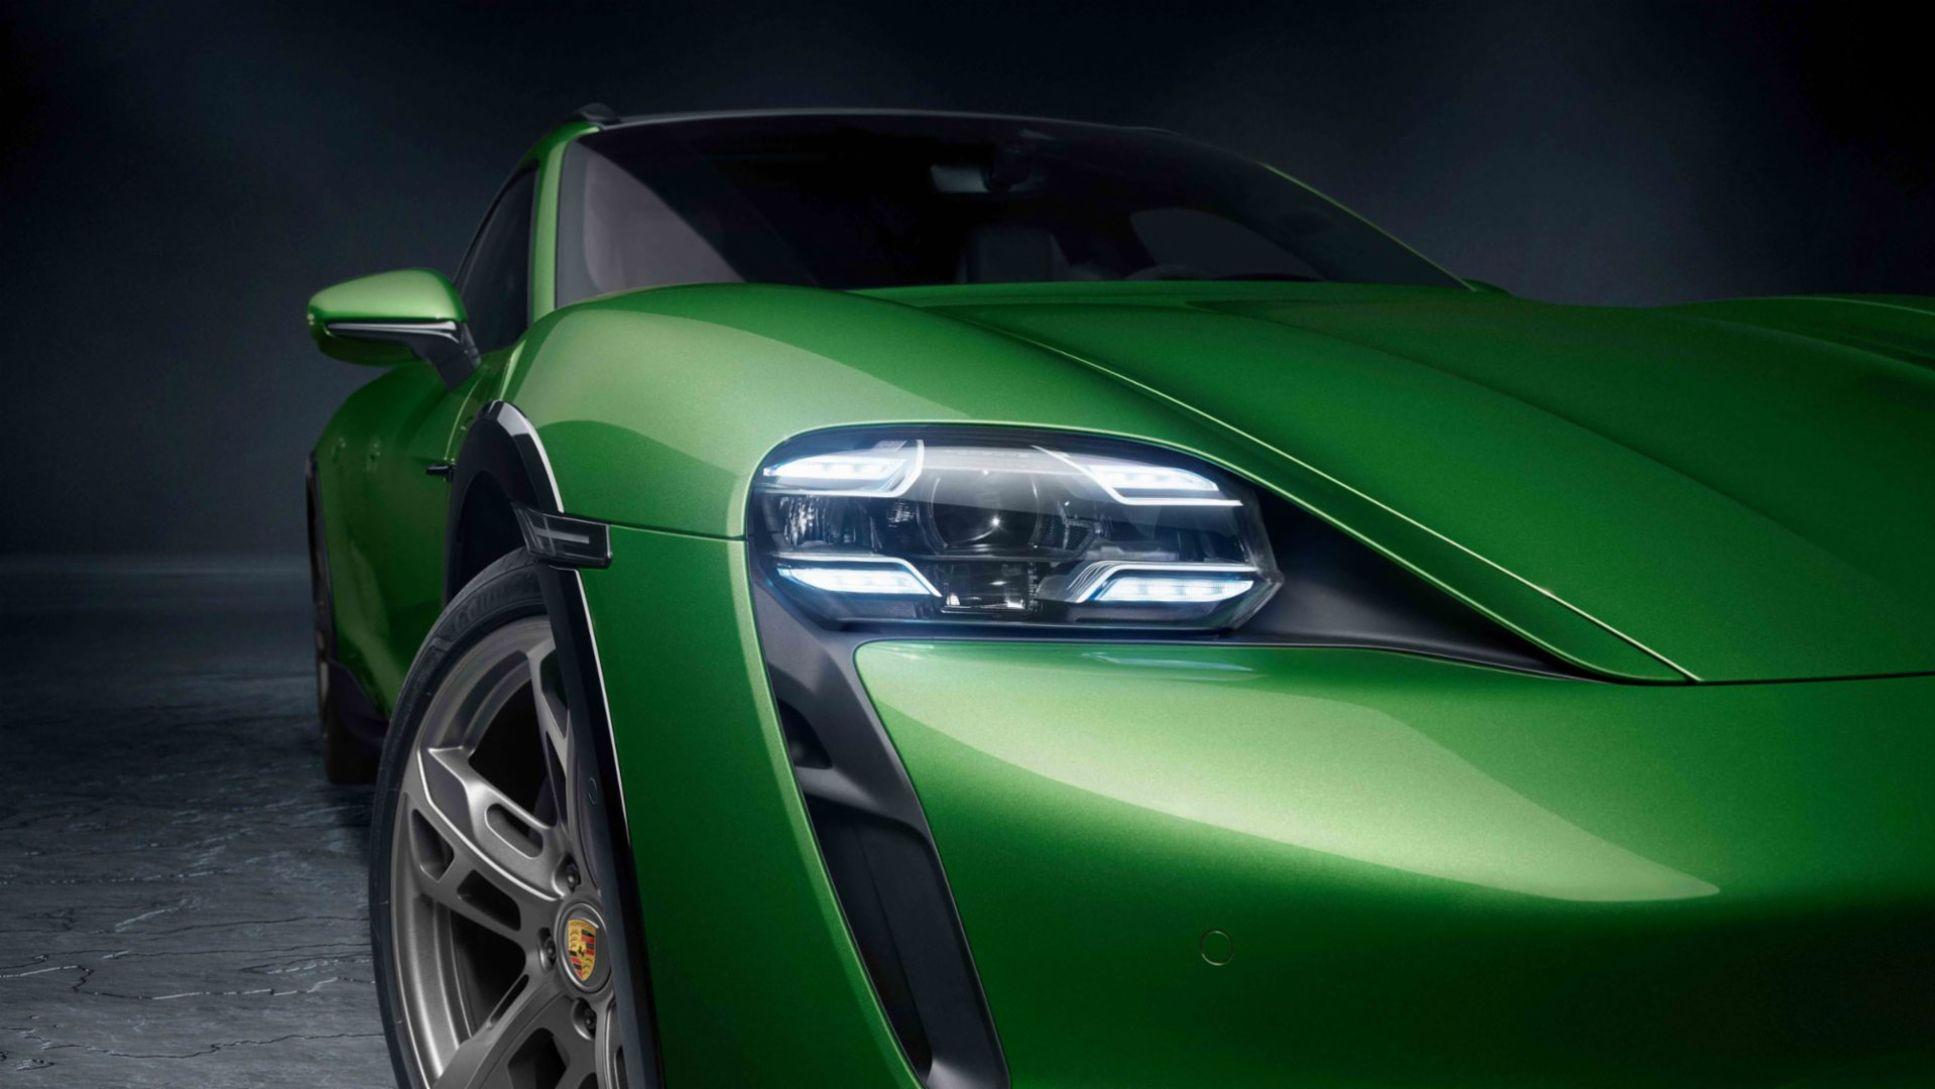 Porsche calls Taycan vehicles to the workshop - Image 1